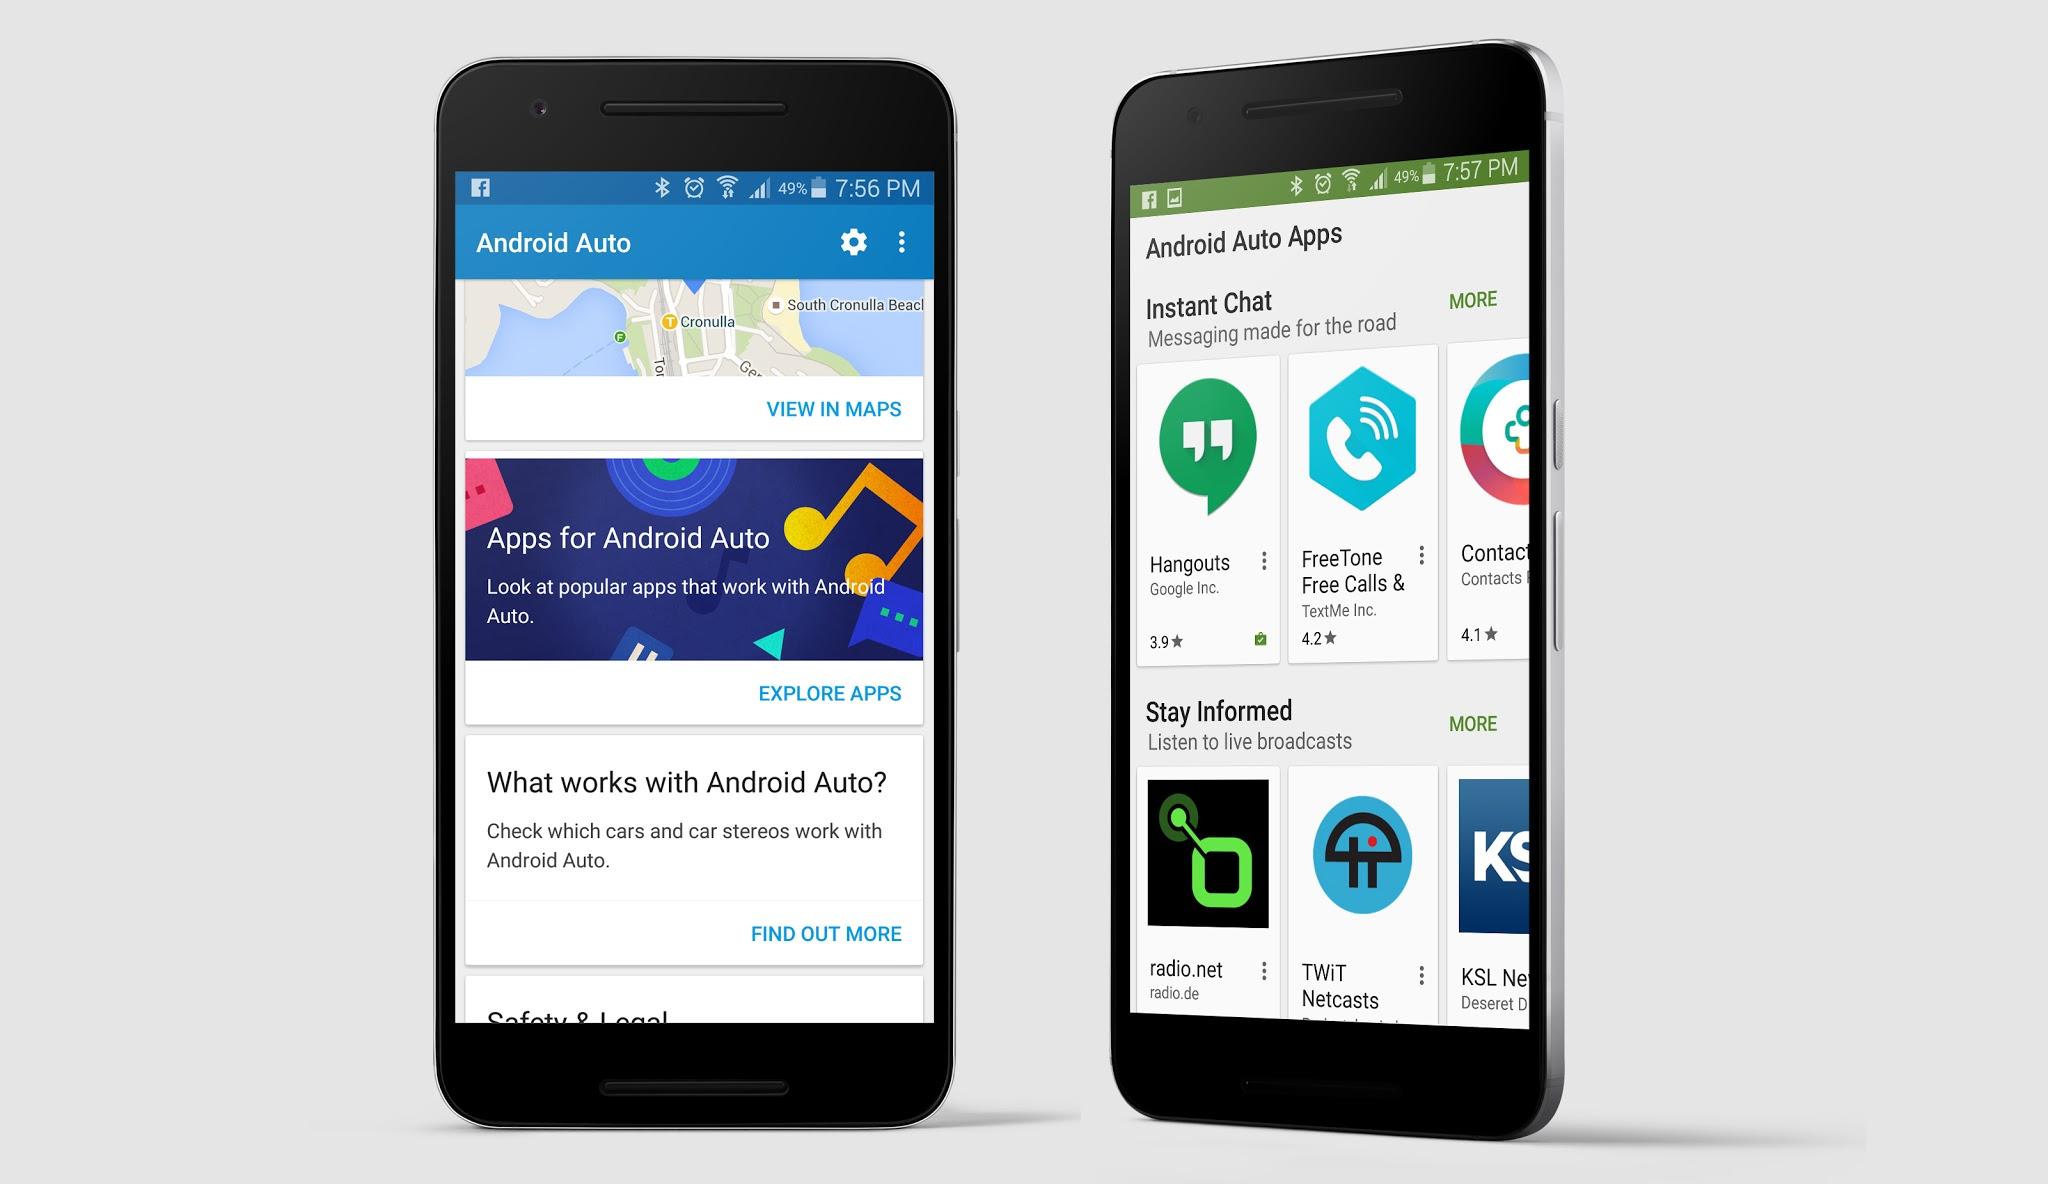 Android Auto Companion App